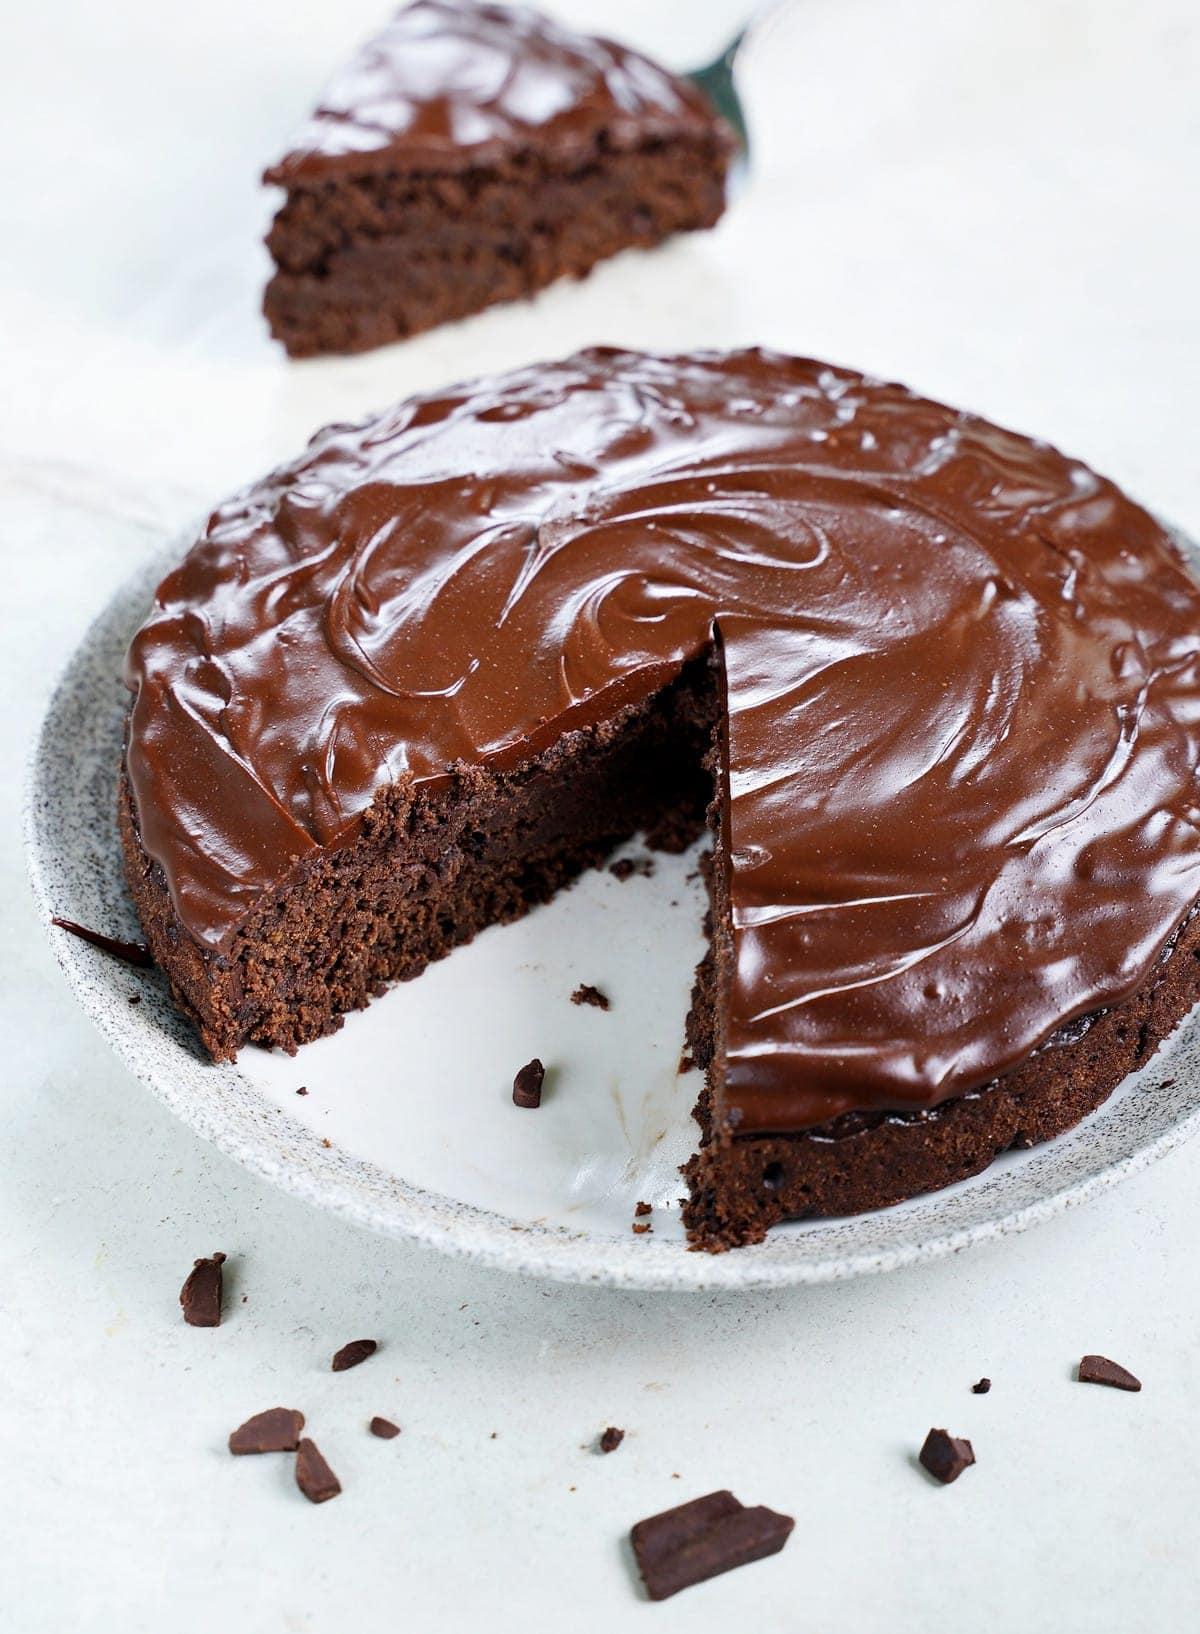 gluten-free chocolate avocado cake with ganache